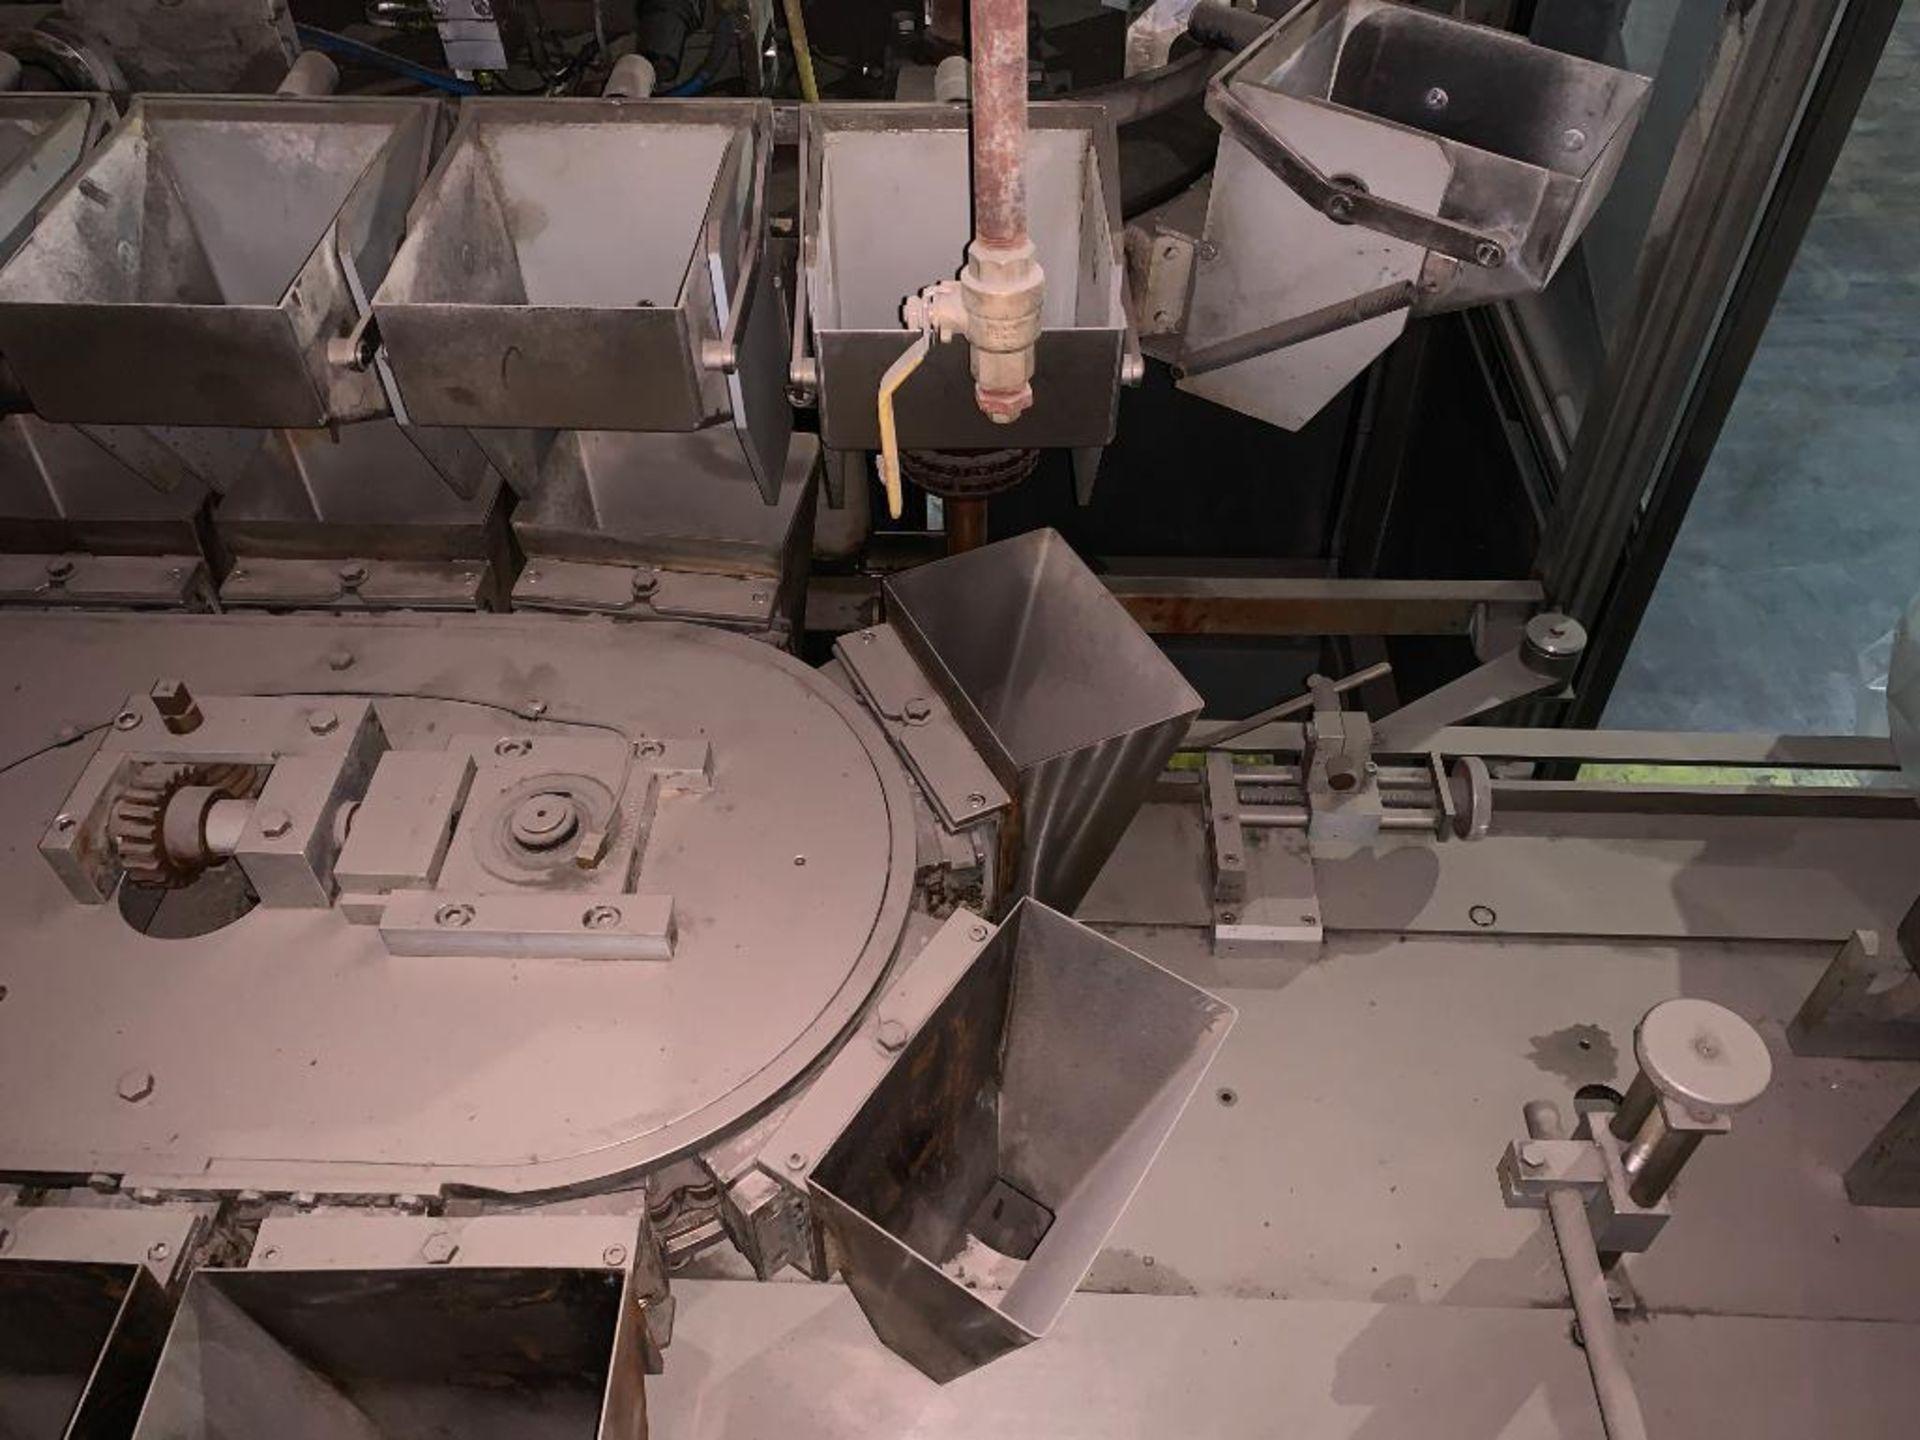 Tisma cartoner, model TC 400 DEMT - Image 16 of 32